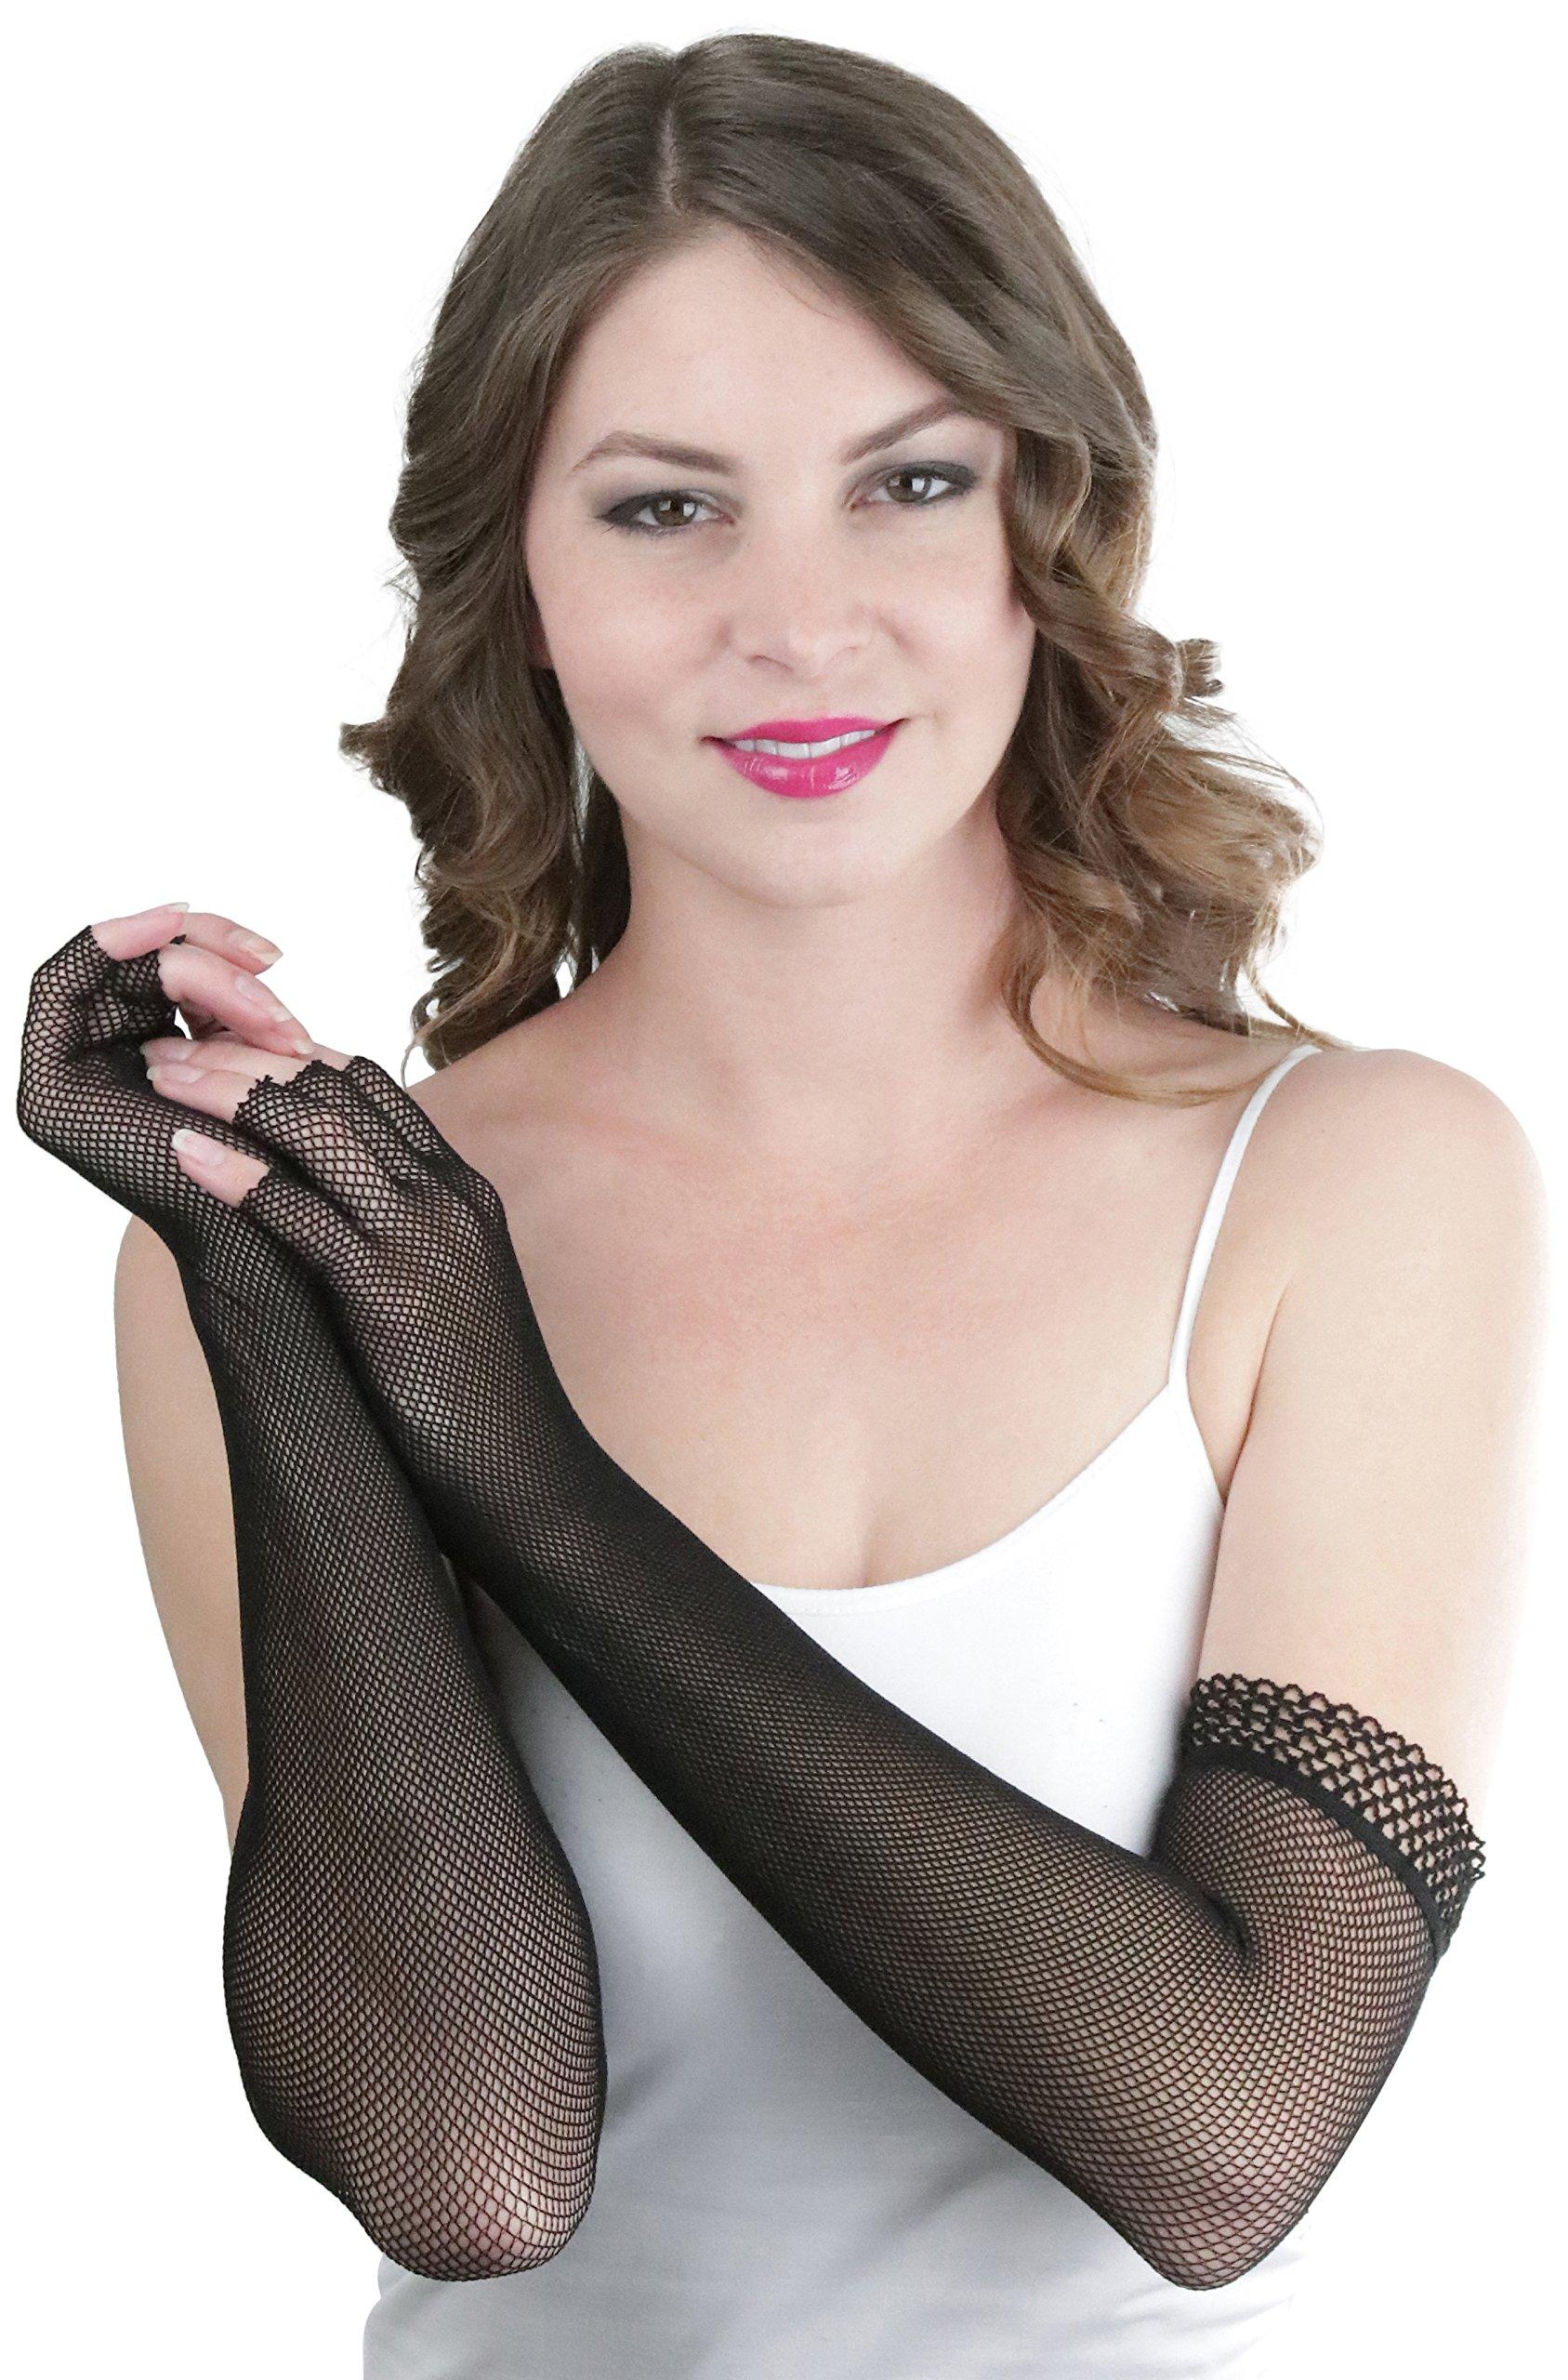 ToBeInStyle Women's Fishnet Trim 100% Nylon Arm Length Glove Warmers - Black